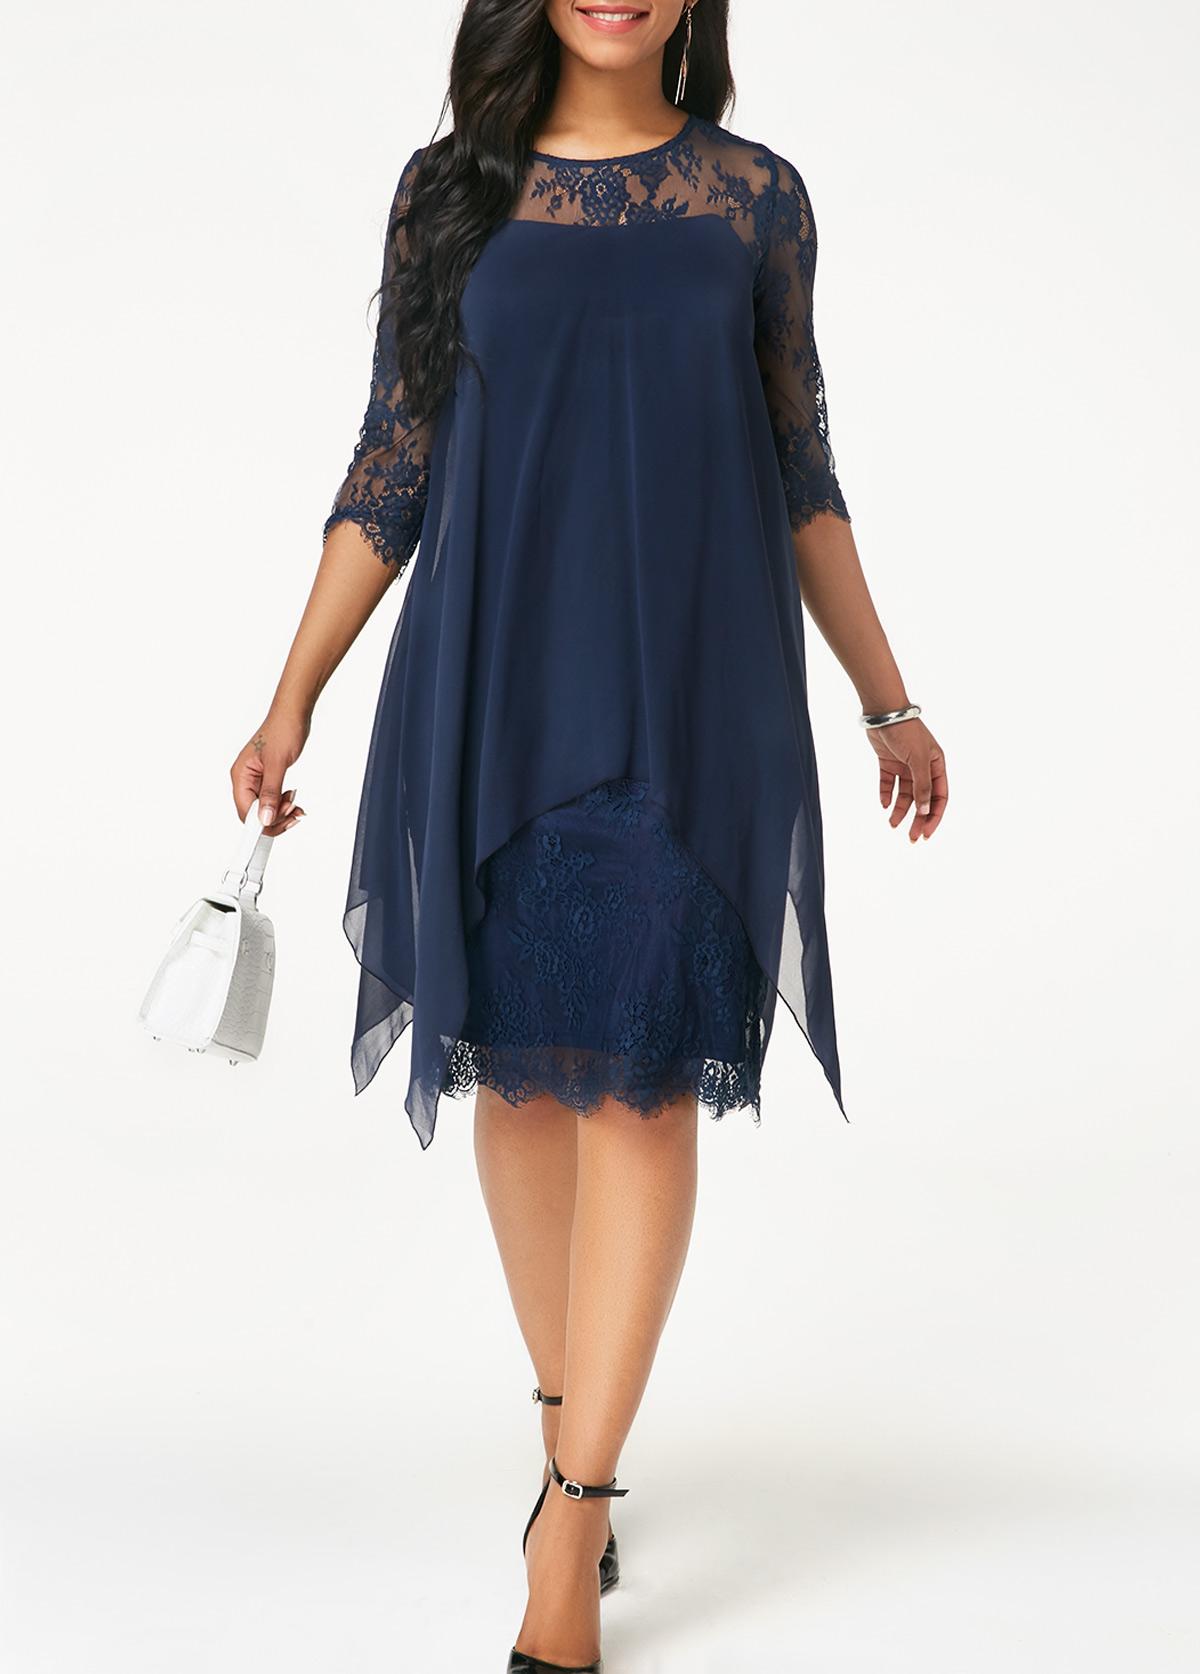 Chiffon Overlay Navy Blue Three Quarter Sleeve Lace Dress